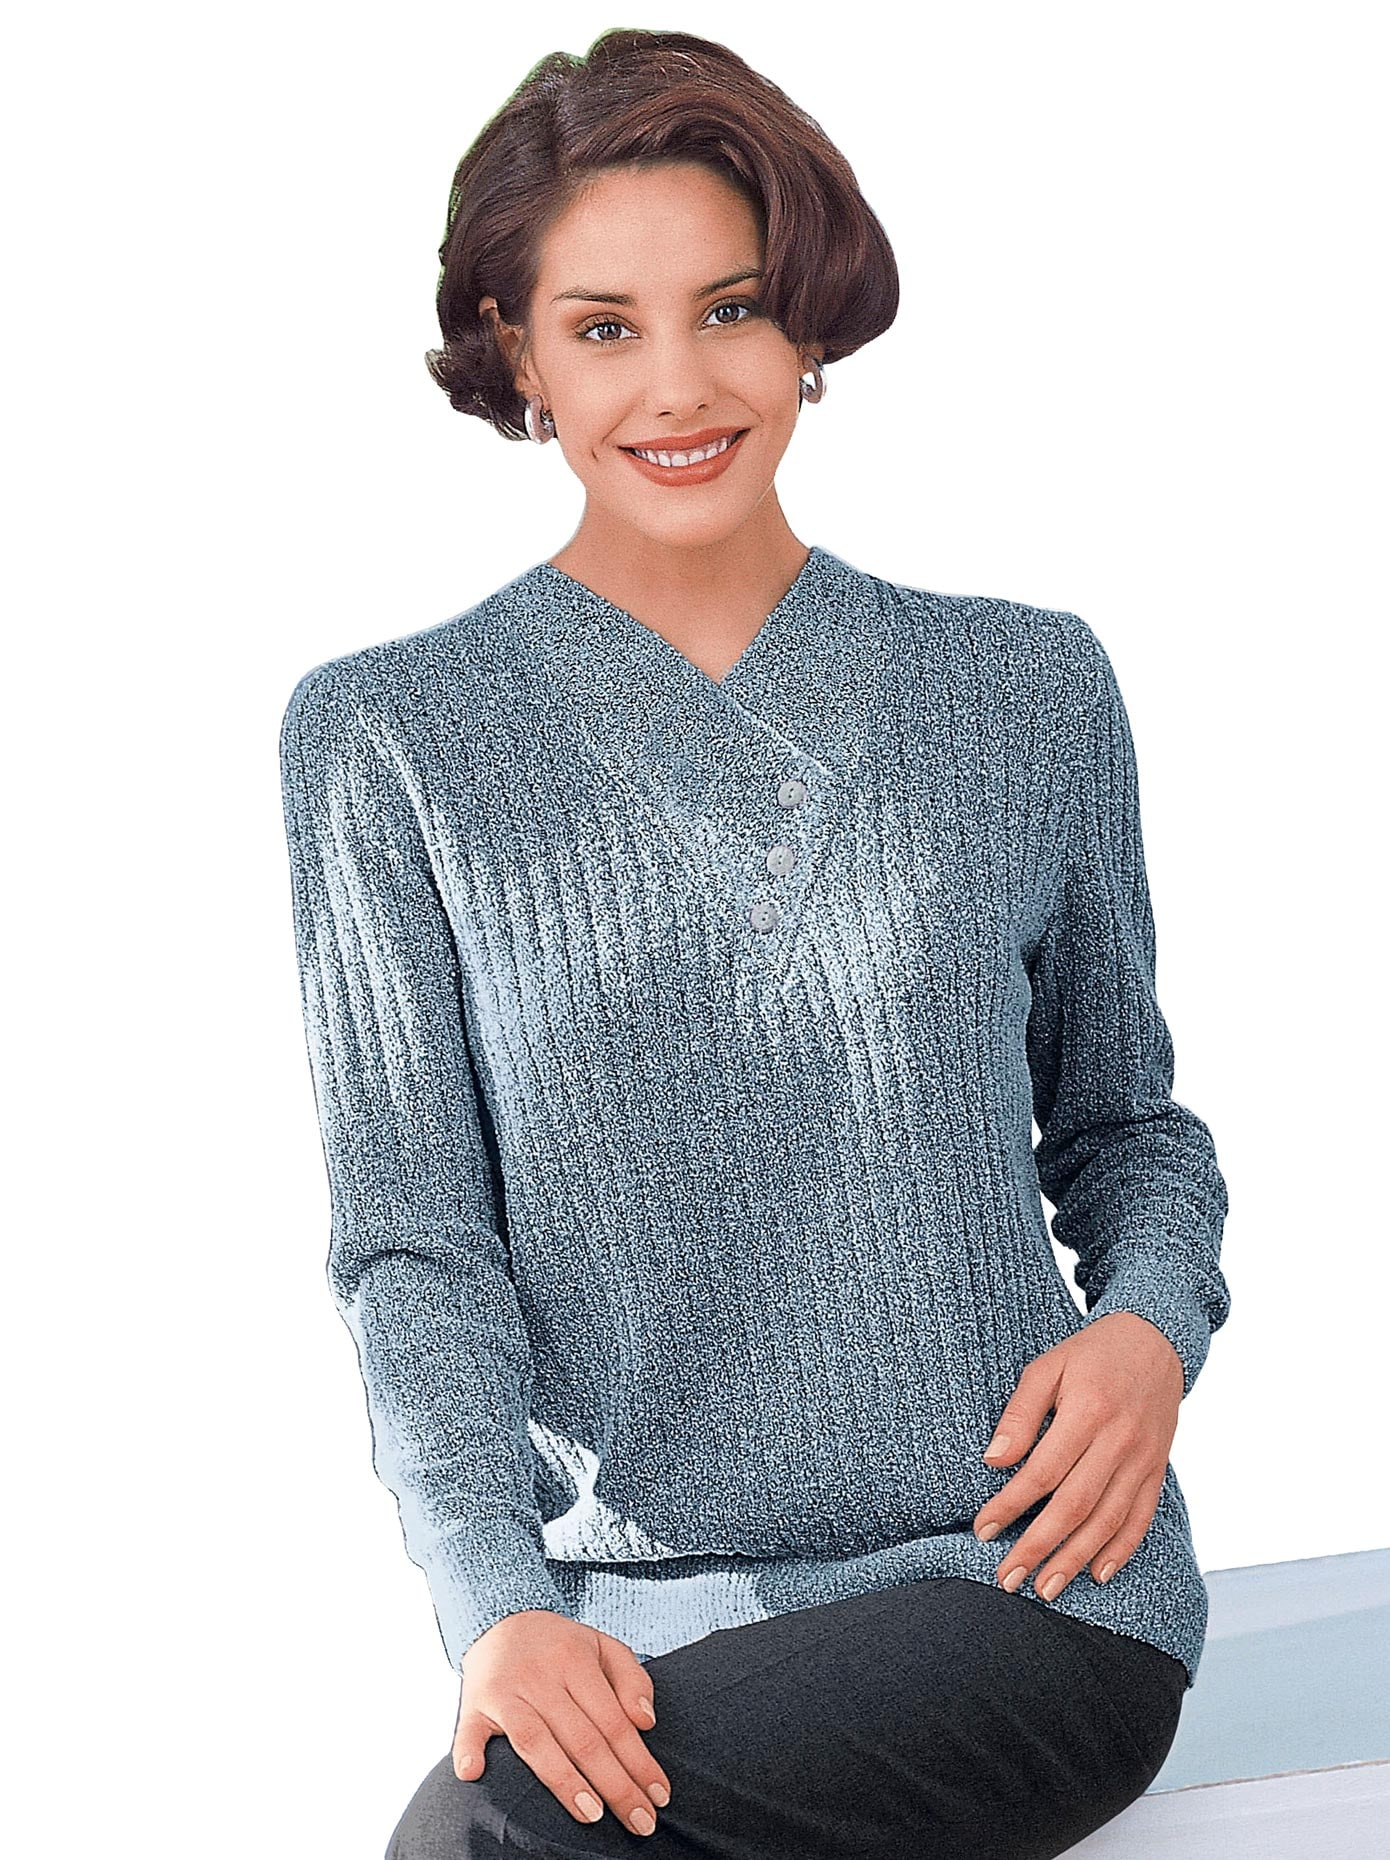 Classic Pullover in topmodischer Rippenstruktur